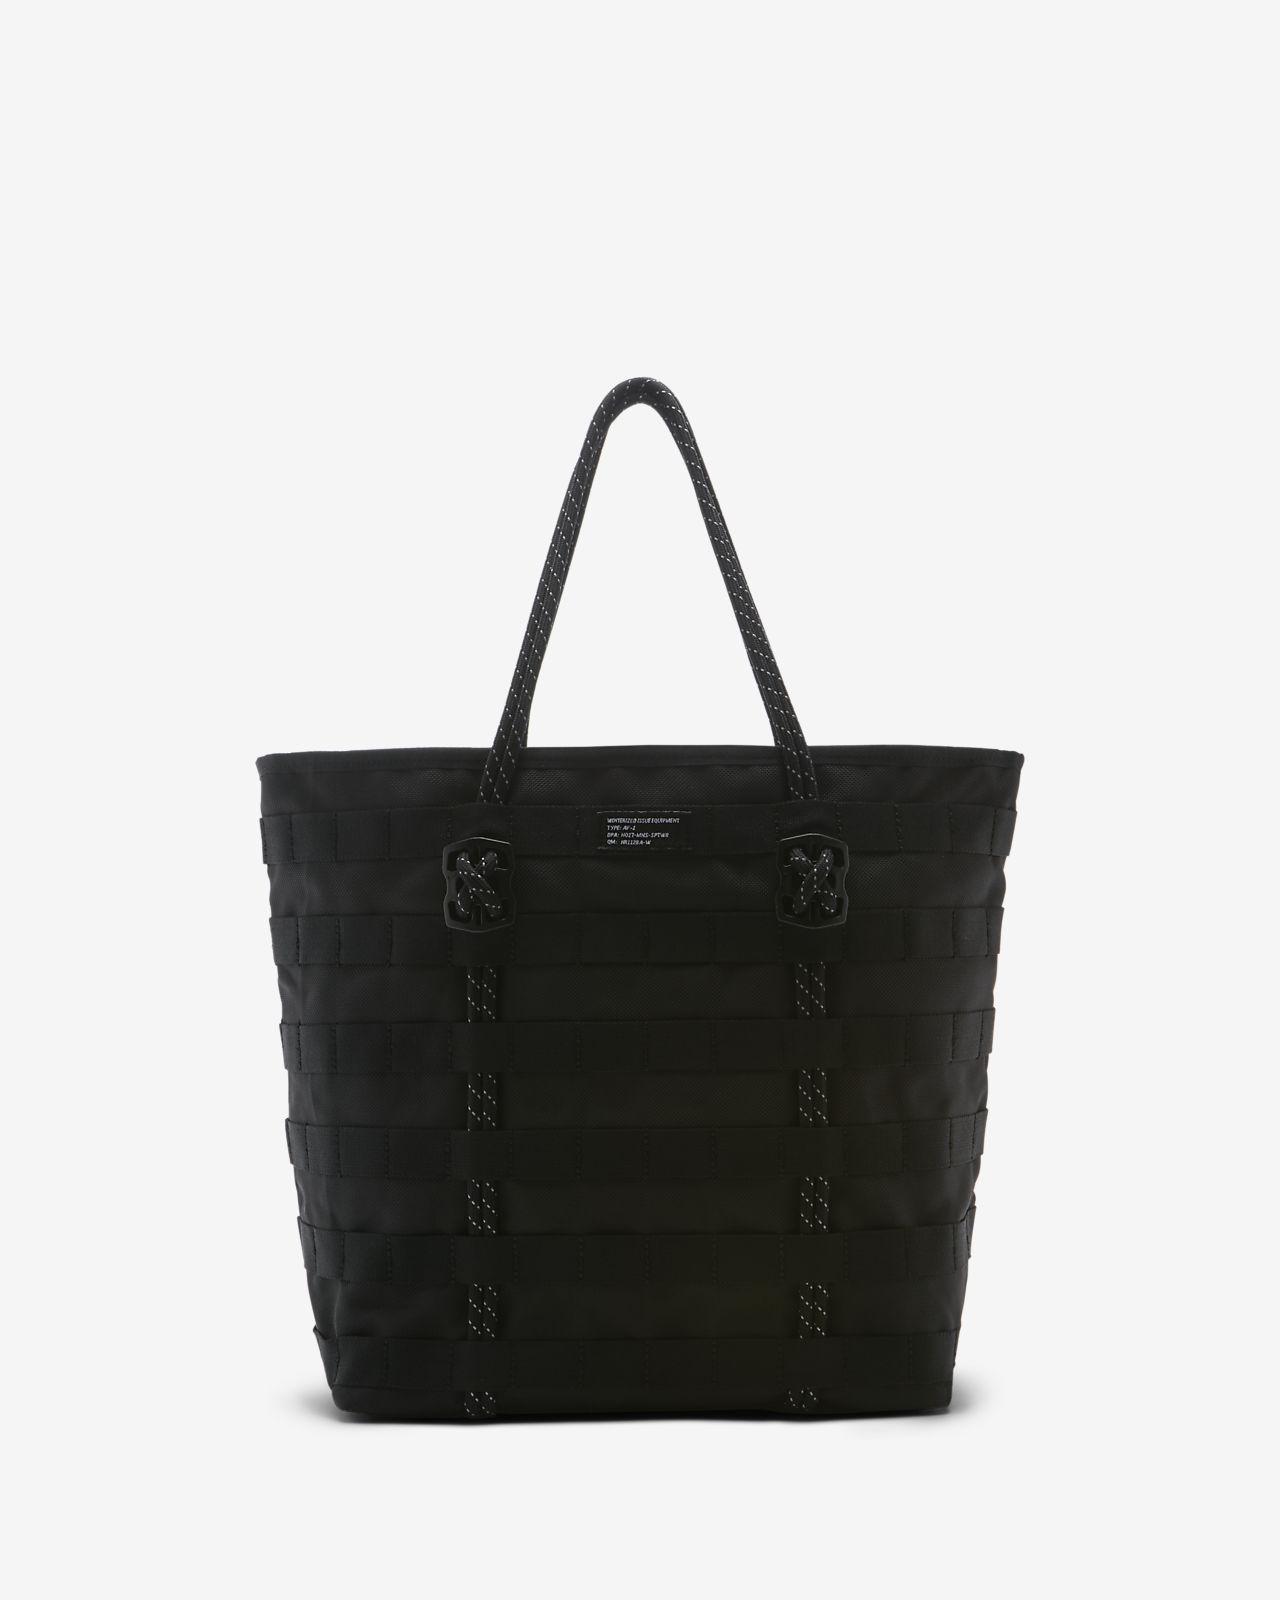 Nike Sportswear AF1 Tote Bag